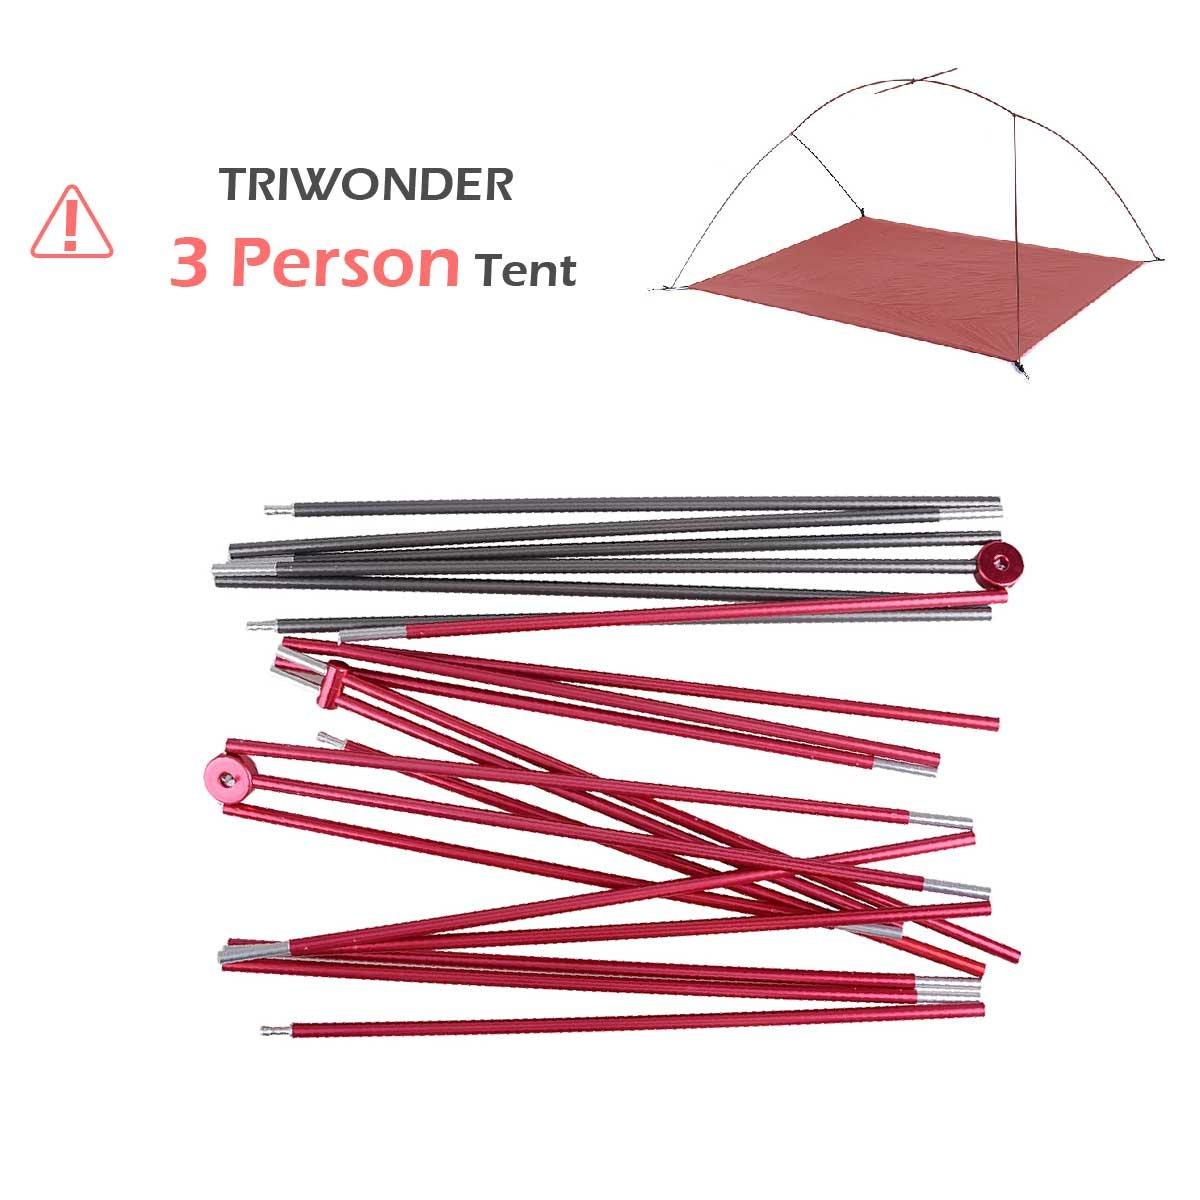 TRIWONDER テントポール アルミポール テントフレーム 交換用テント ポール 中空ポール タープポール  TRIWONDER 3人用テント B074QRK491